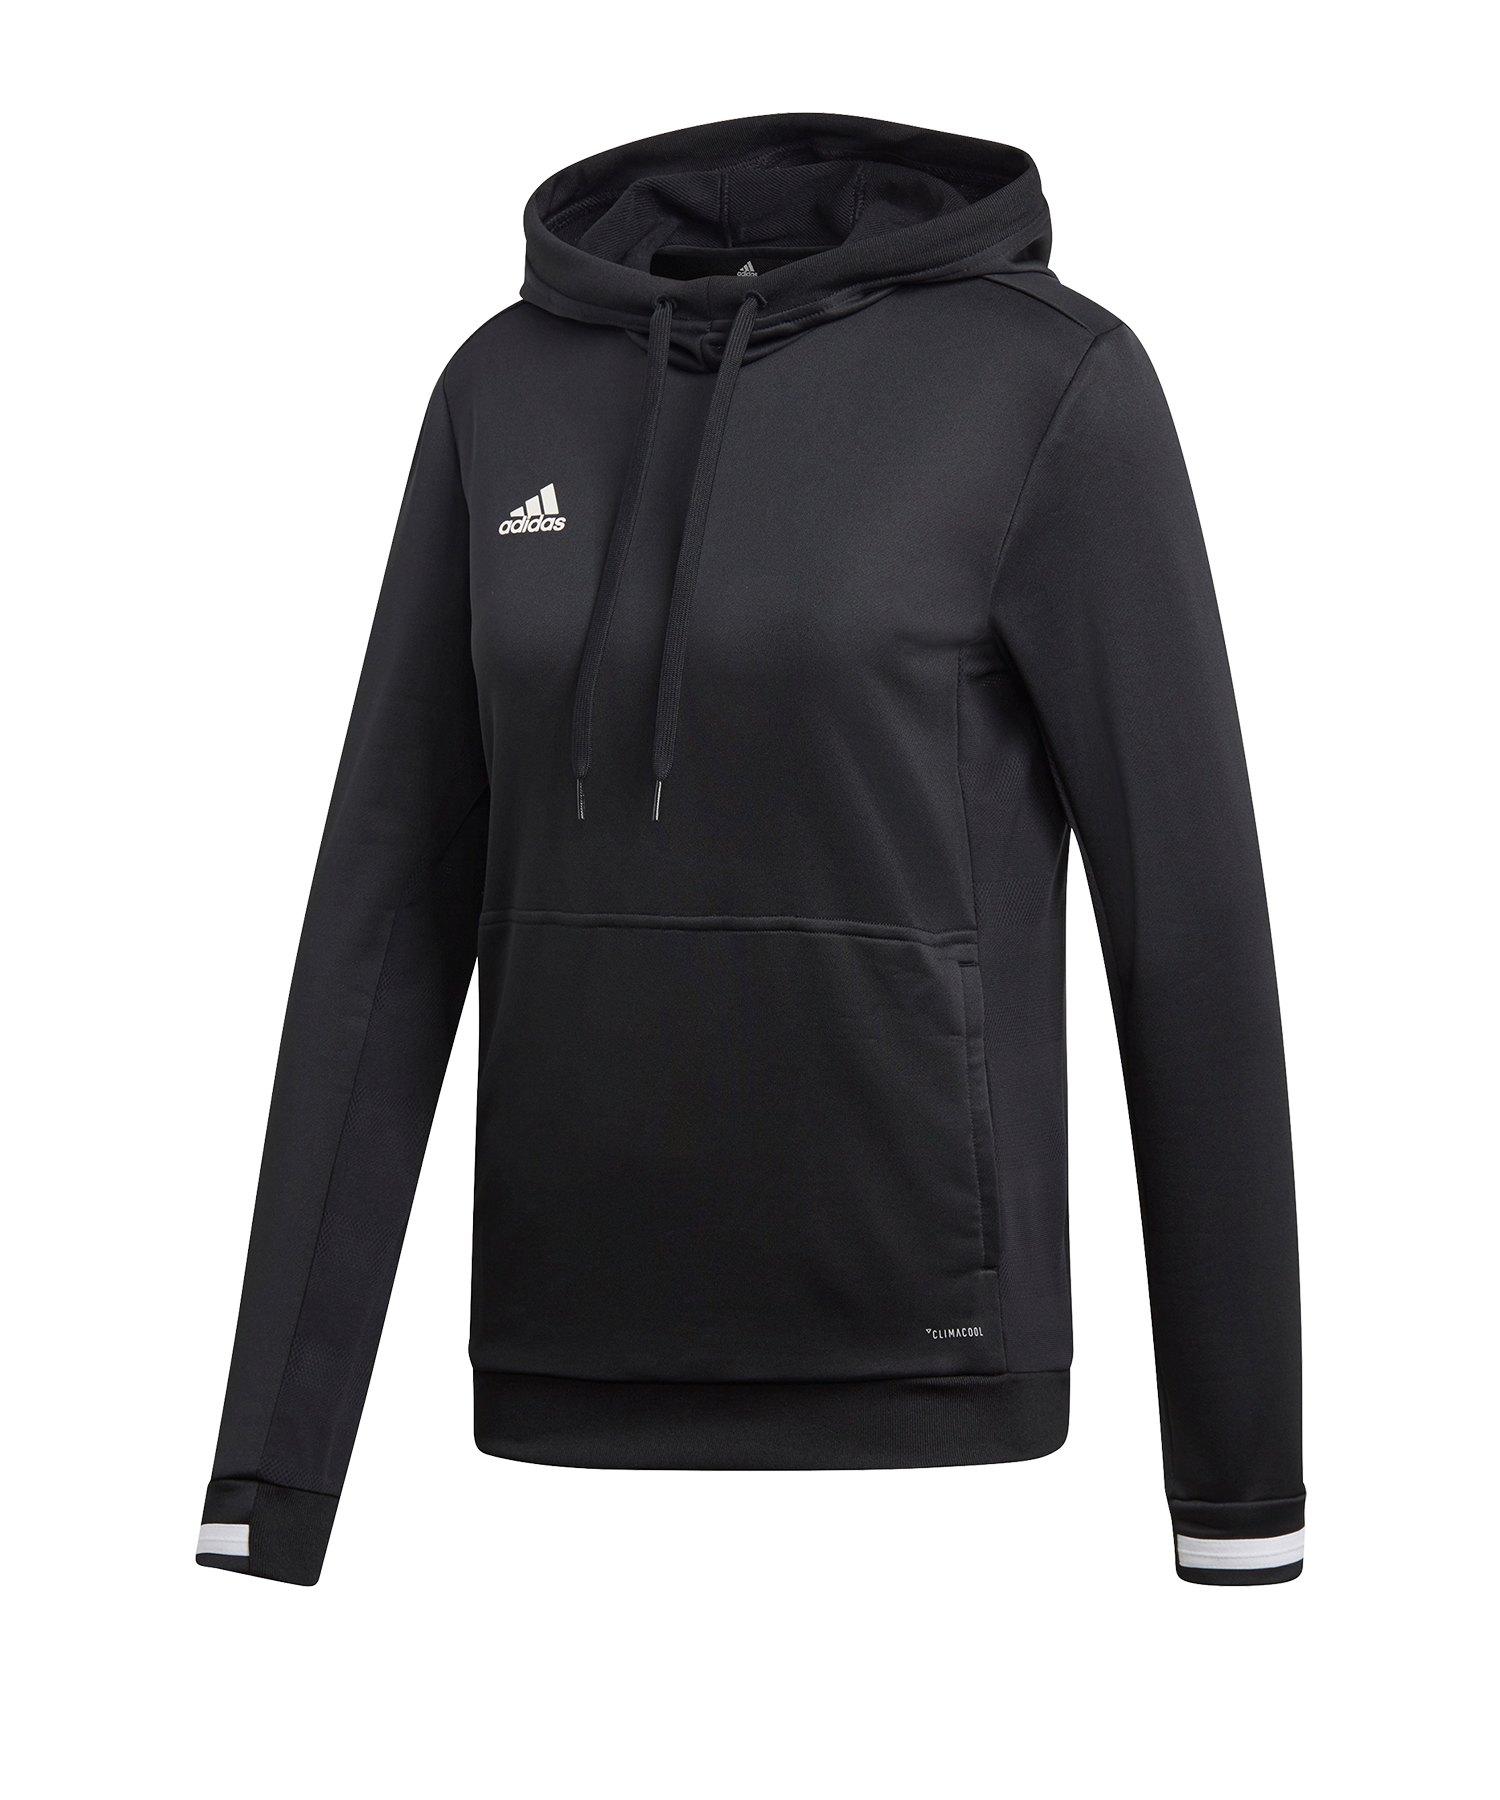 adidas Team 19 Kapuzensweatshirt Damen Schwarz - schwarz